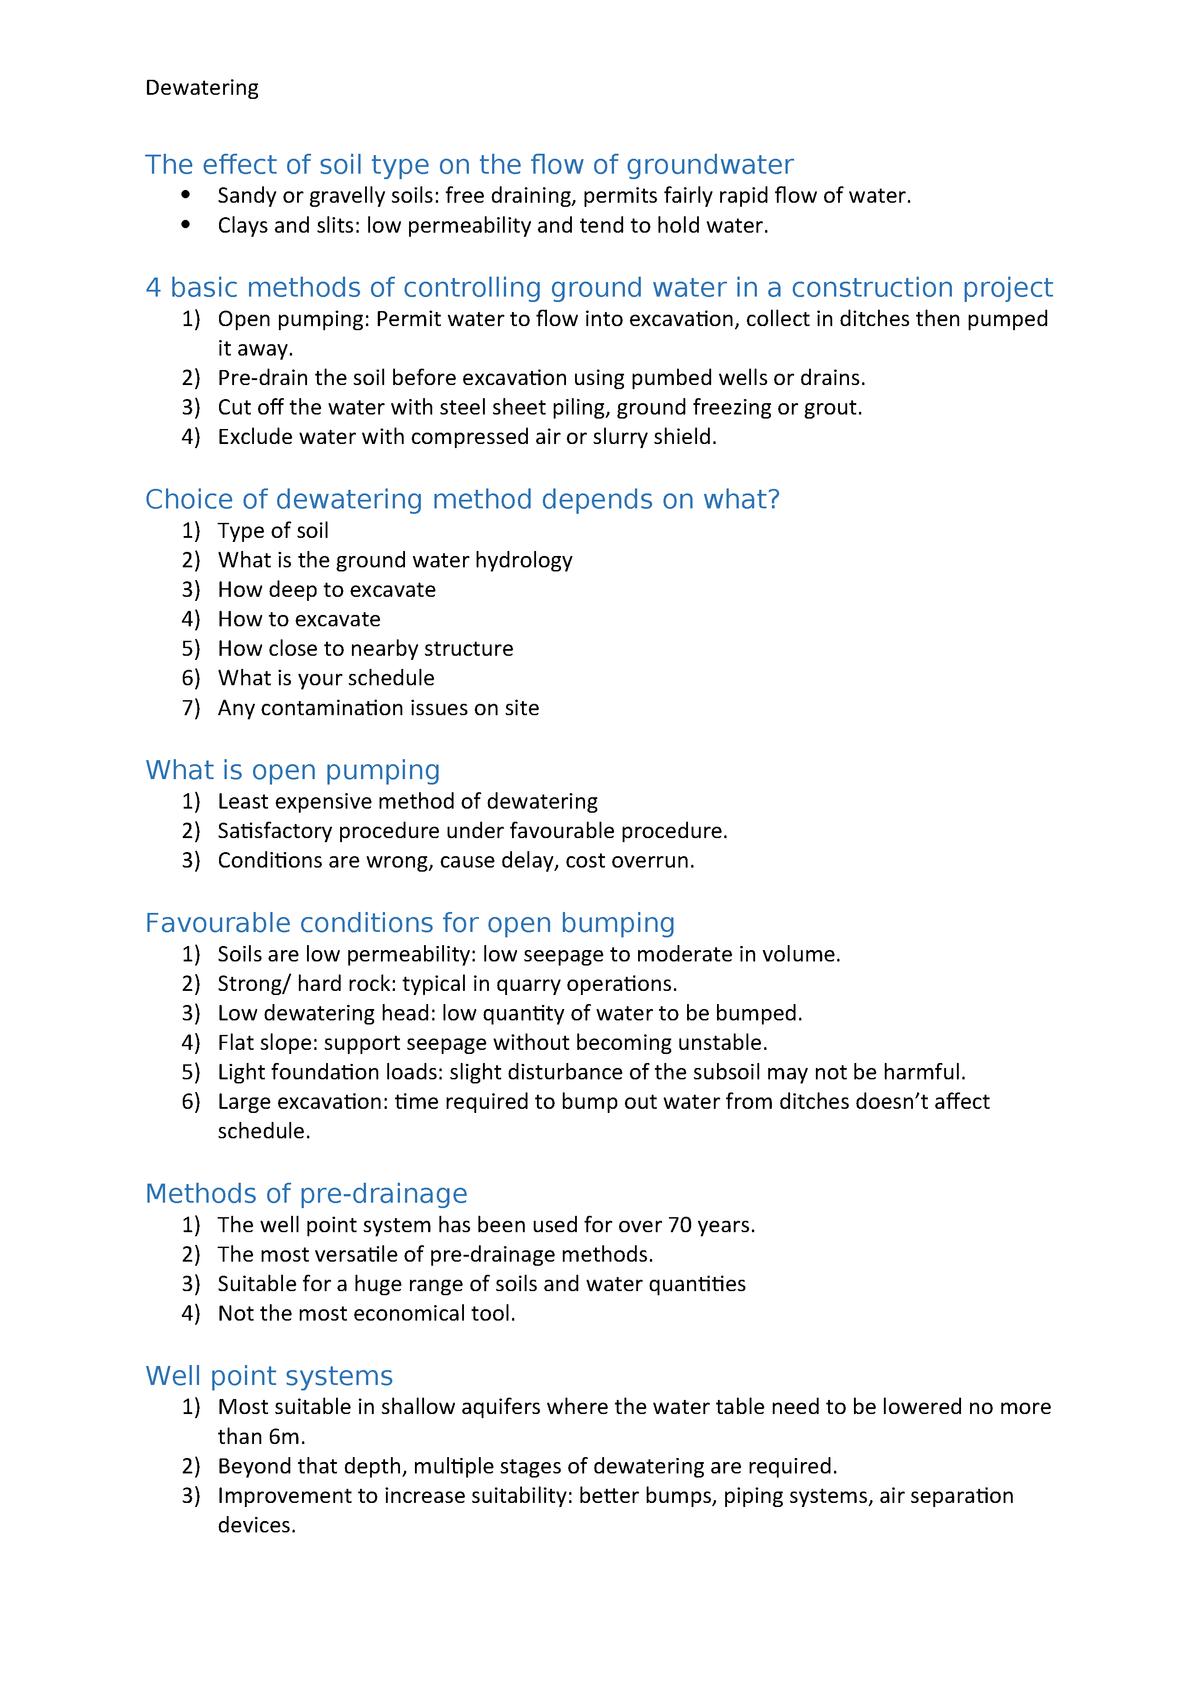 Summary CVEN2101 CVEN2101 25 Apr 2018 - StuDocu